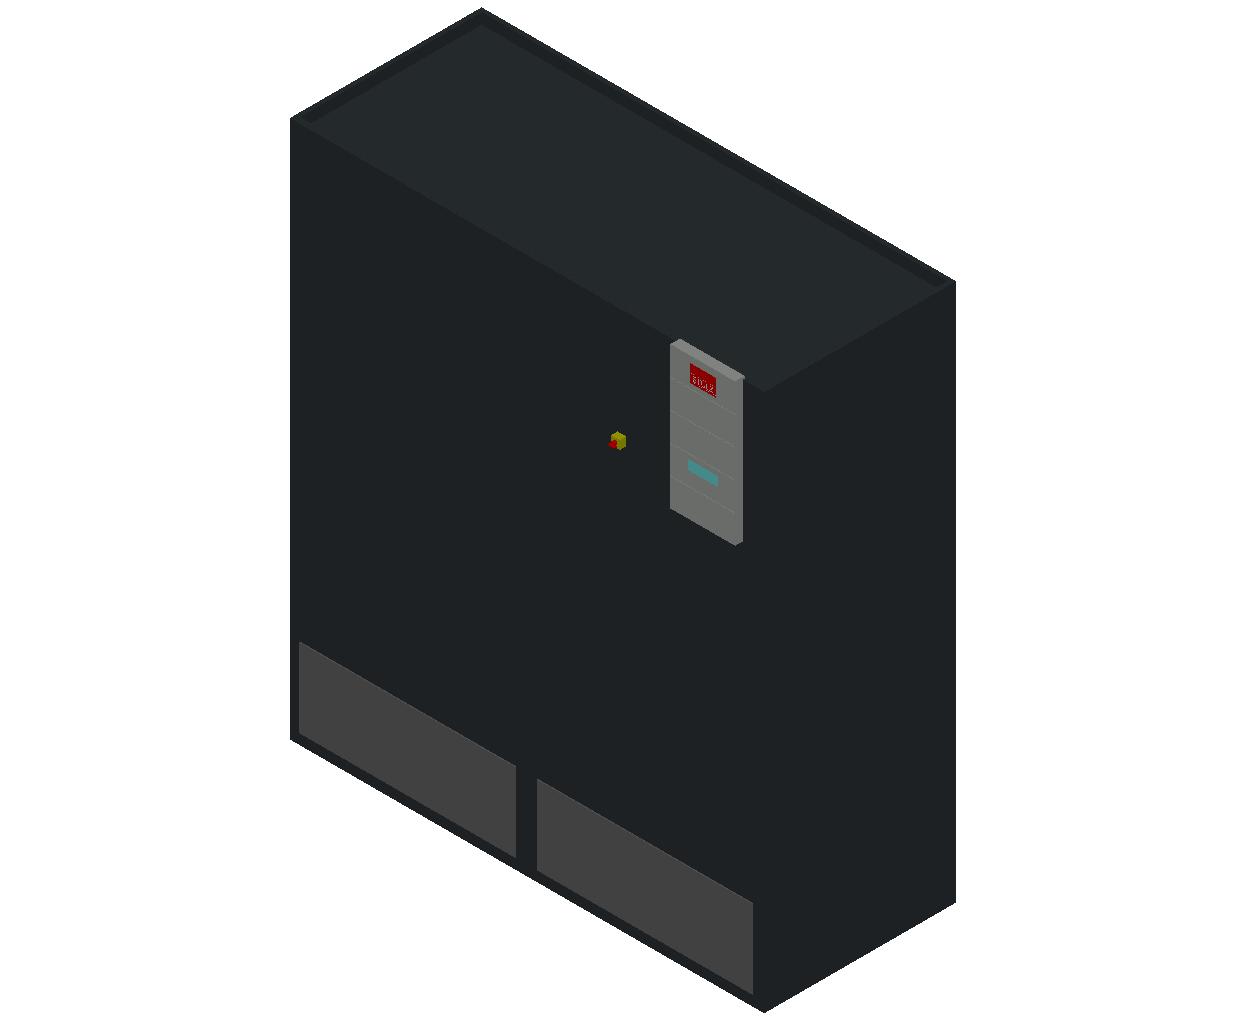 HC_Air Conditioner_Indoor Unit_MEPcontent_STULZ_CyberAir 3PRO_ALR_Dual Circuit GES_ALR_432_GES_INT-EN.dwg